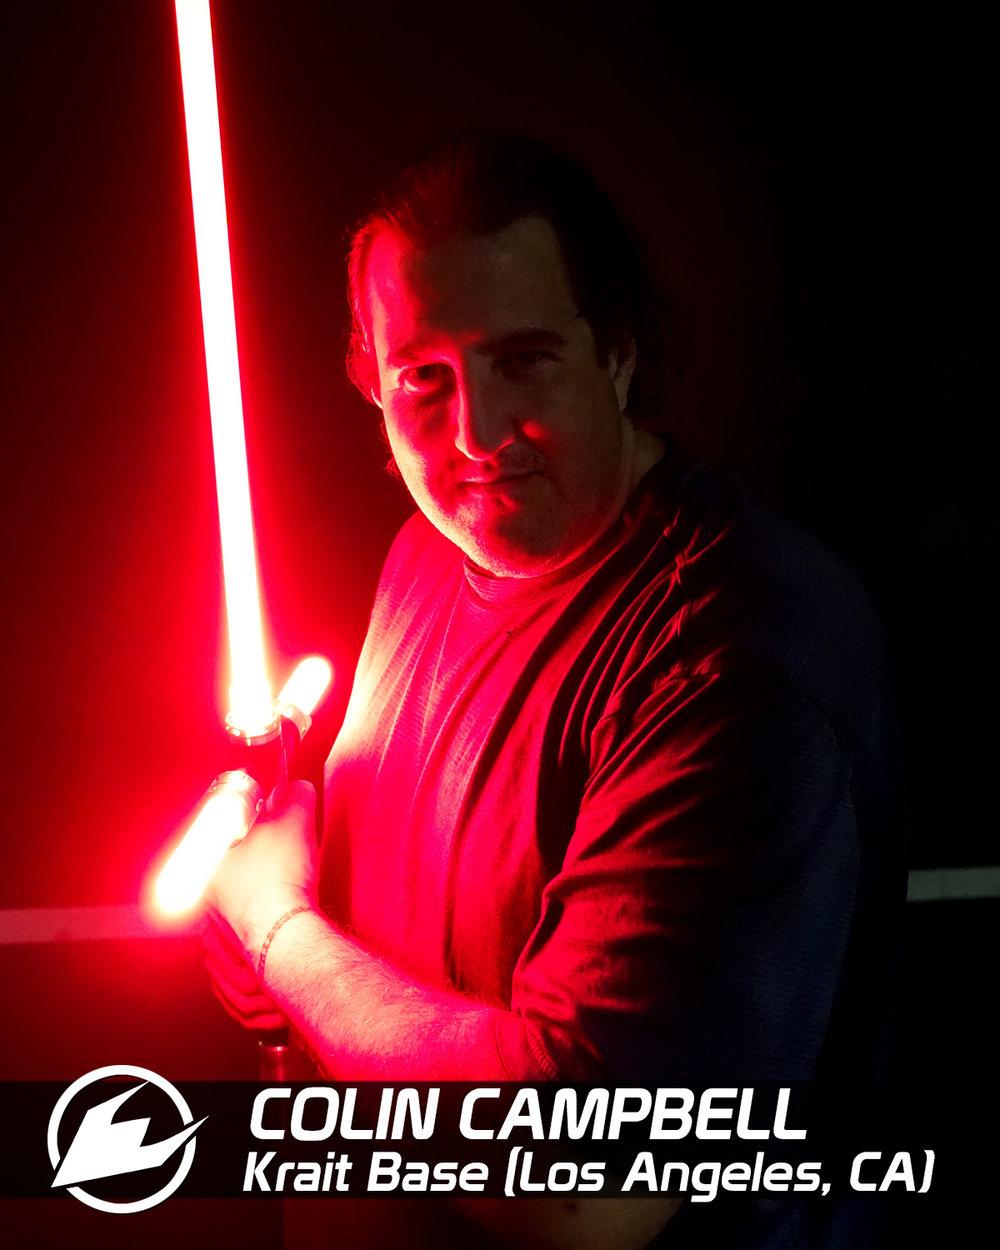 ColinCampbell180922.jpg